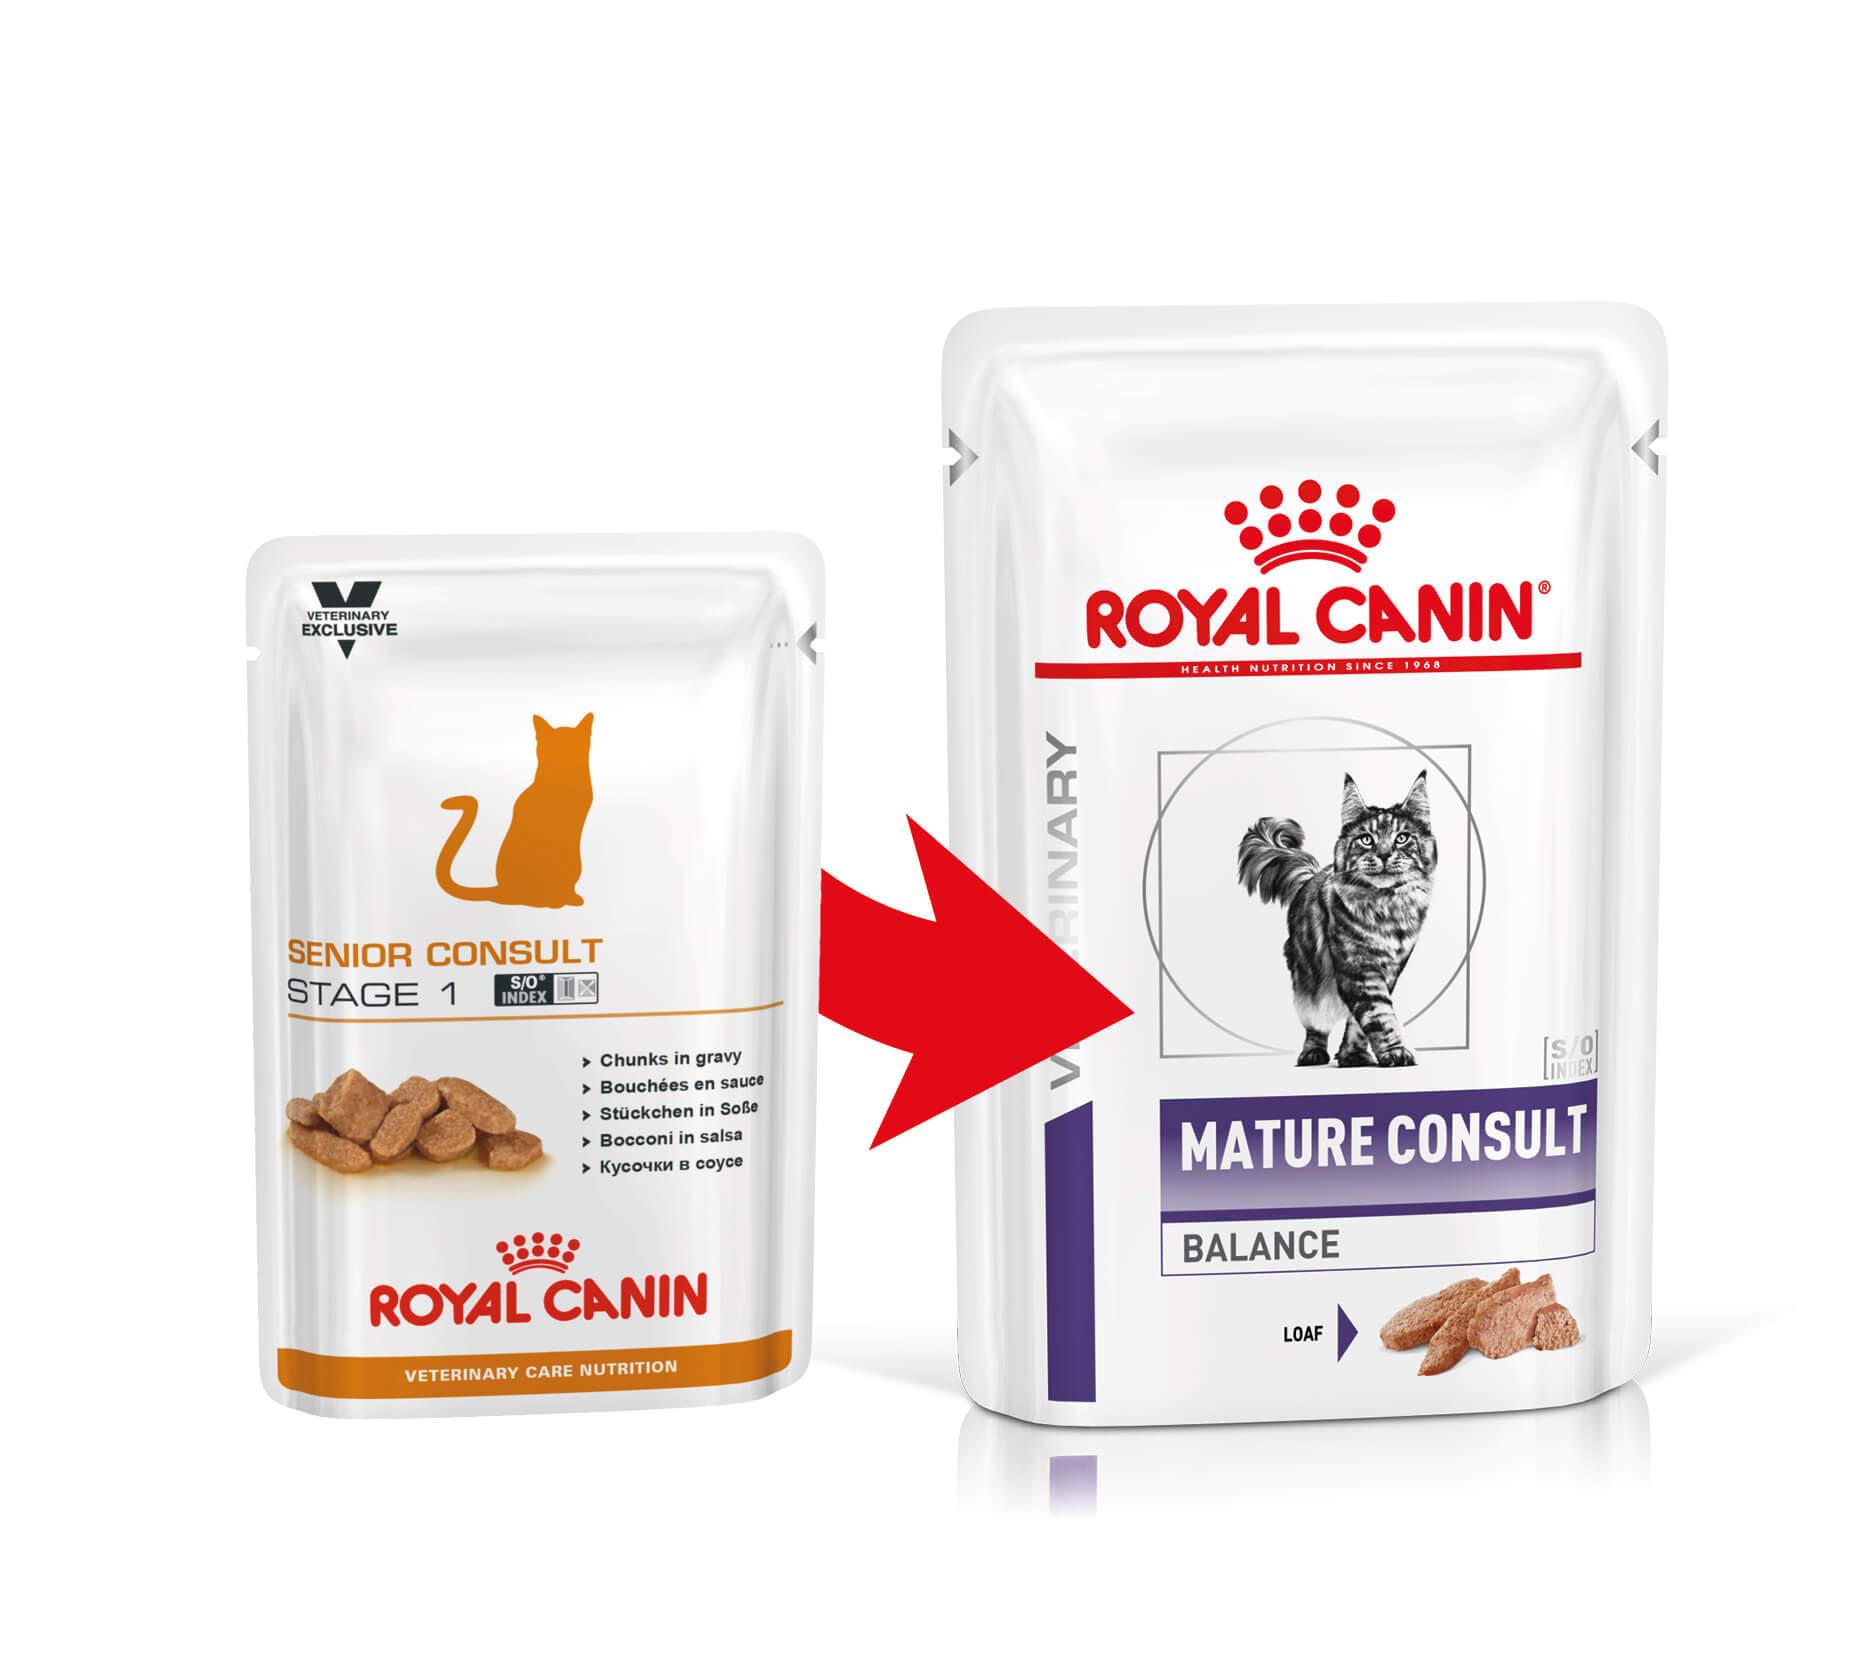 Royal Canin Veterinary Mature Consult Balance pâtée pour chat (85 gr)